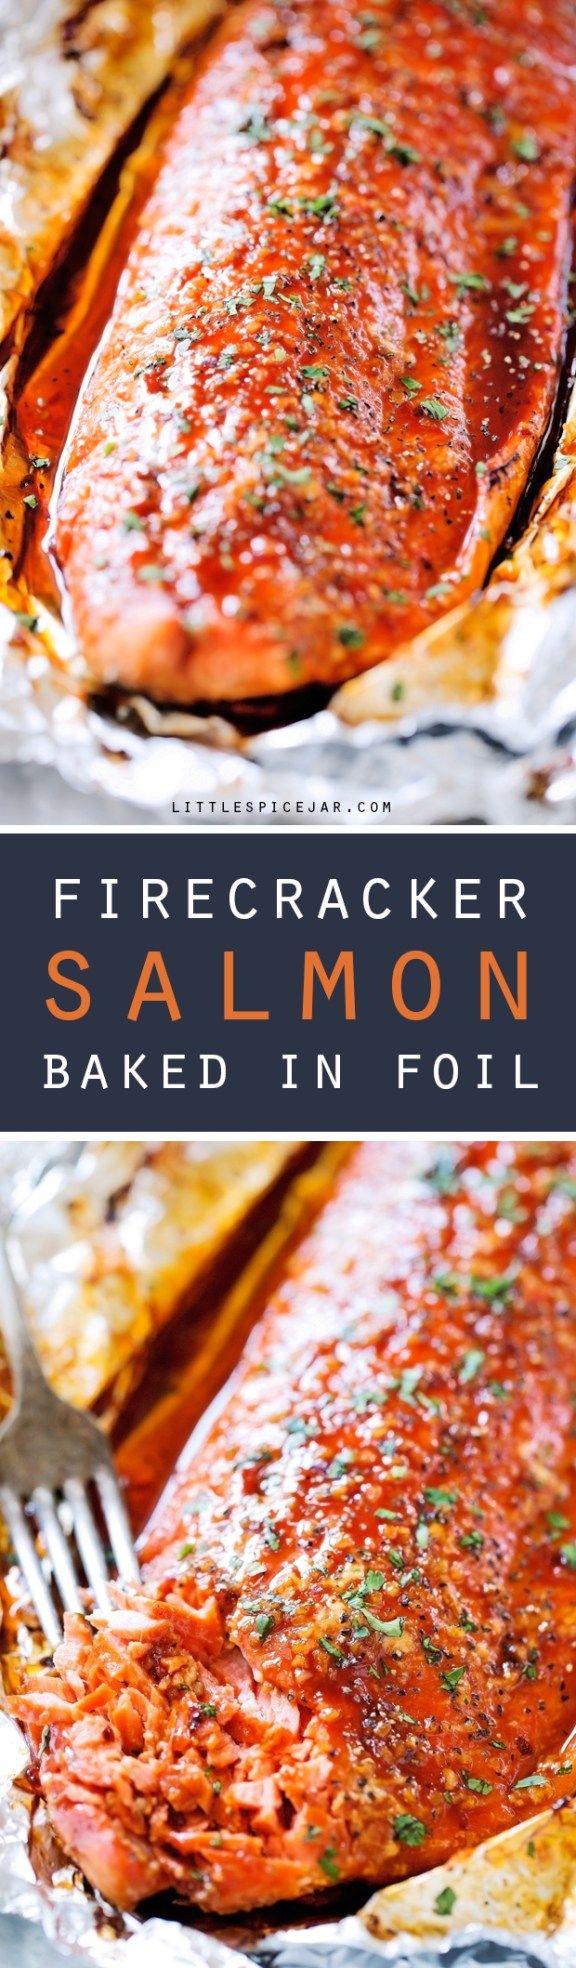 Firecracker Baked Salmon in Foil - An easy baked salmon recipe that ...